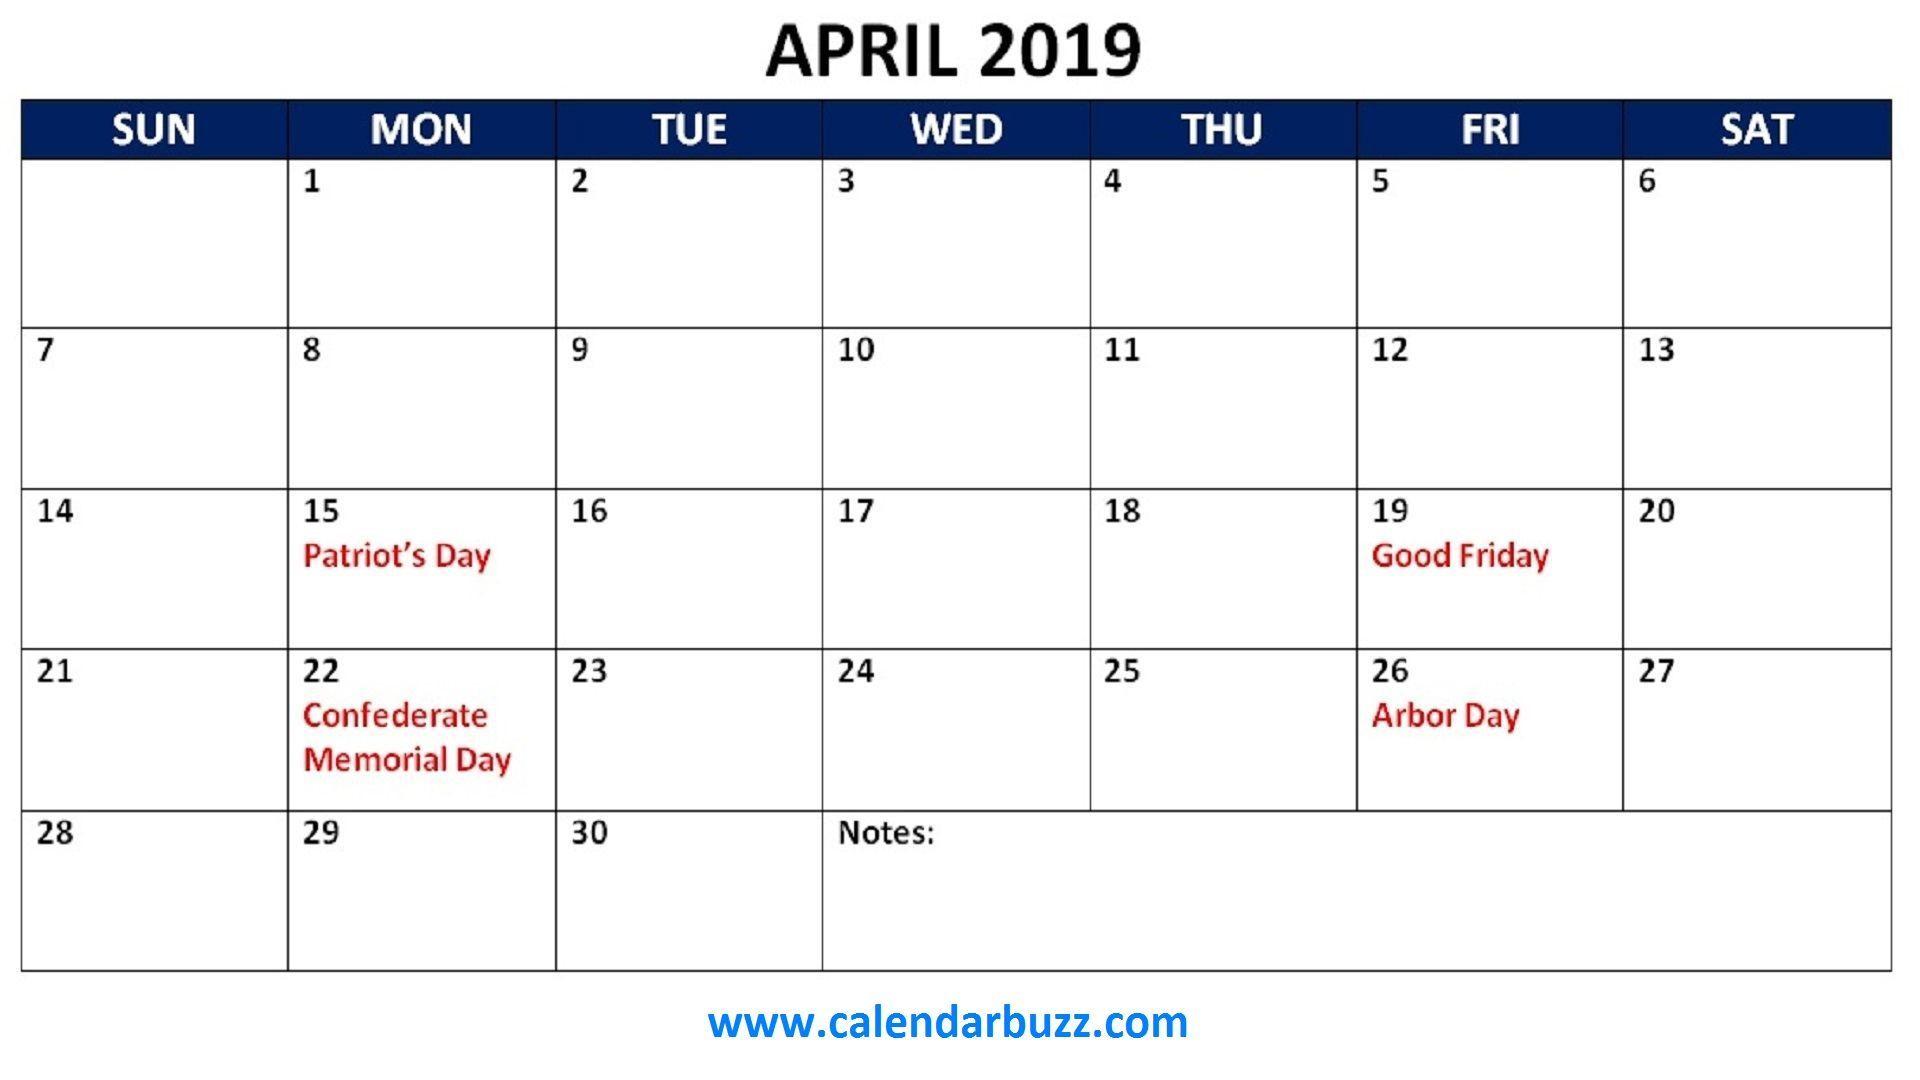 April 2019 Calendar With Holidays - Free Printable Calendar, Blank in Calendar With Holidays Printable Templates